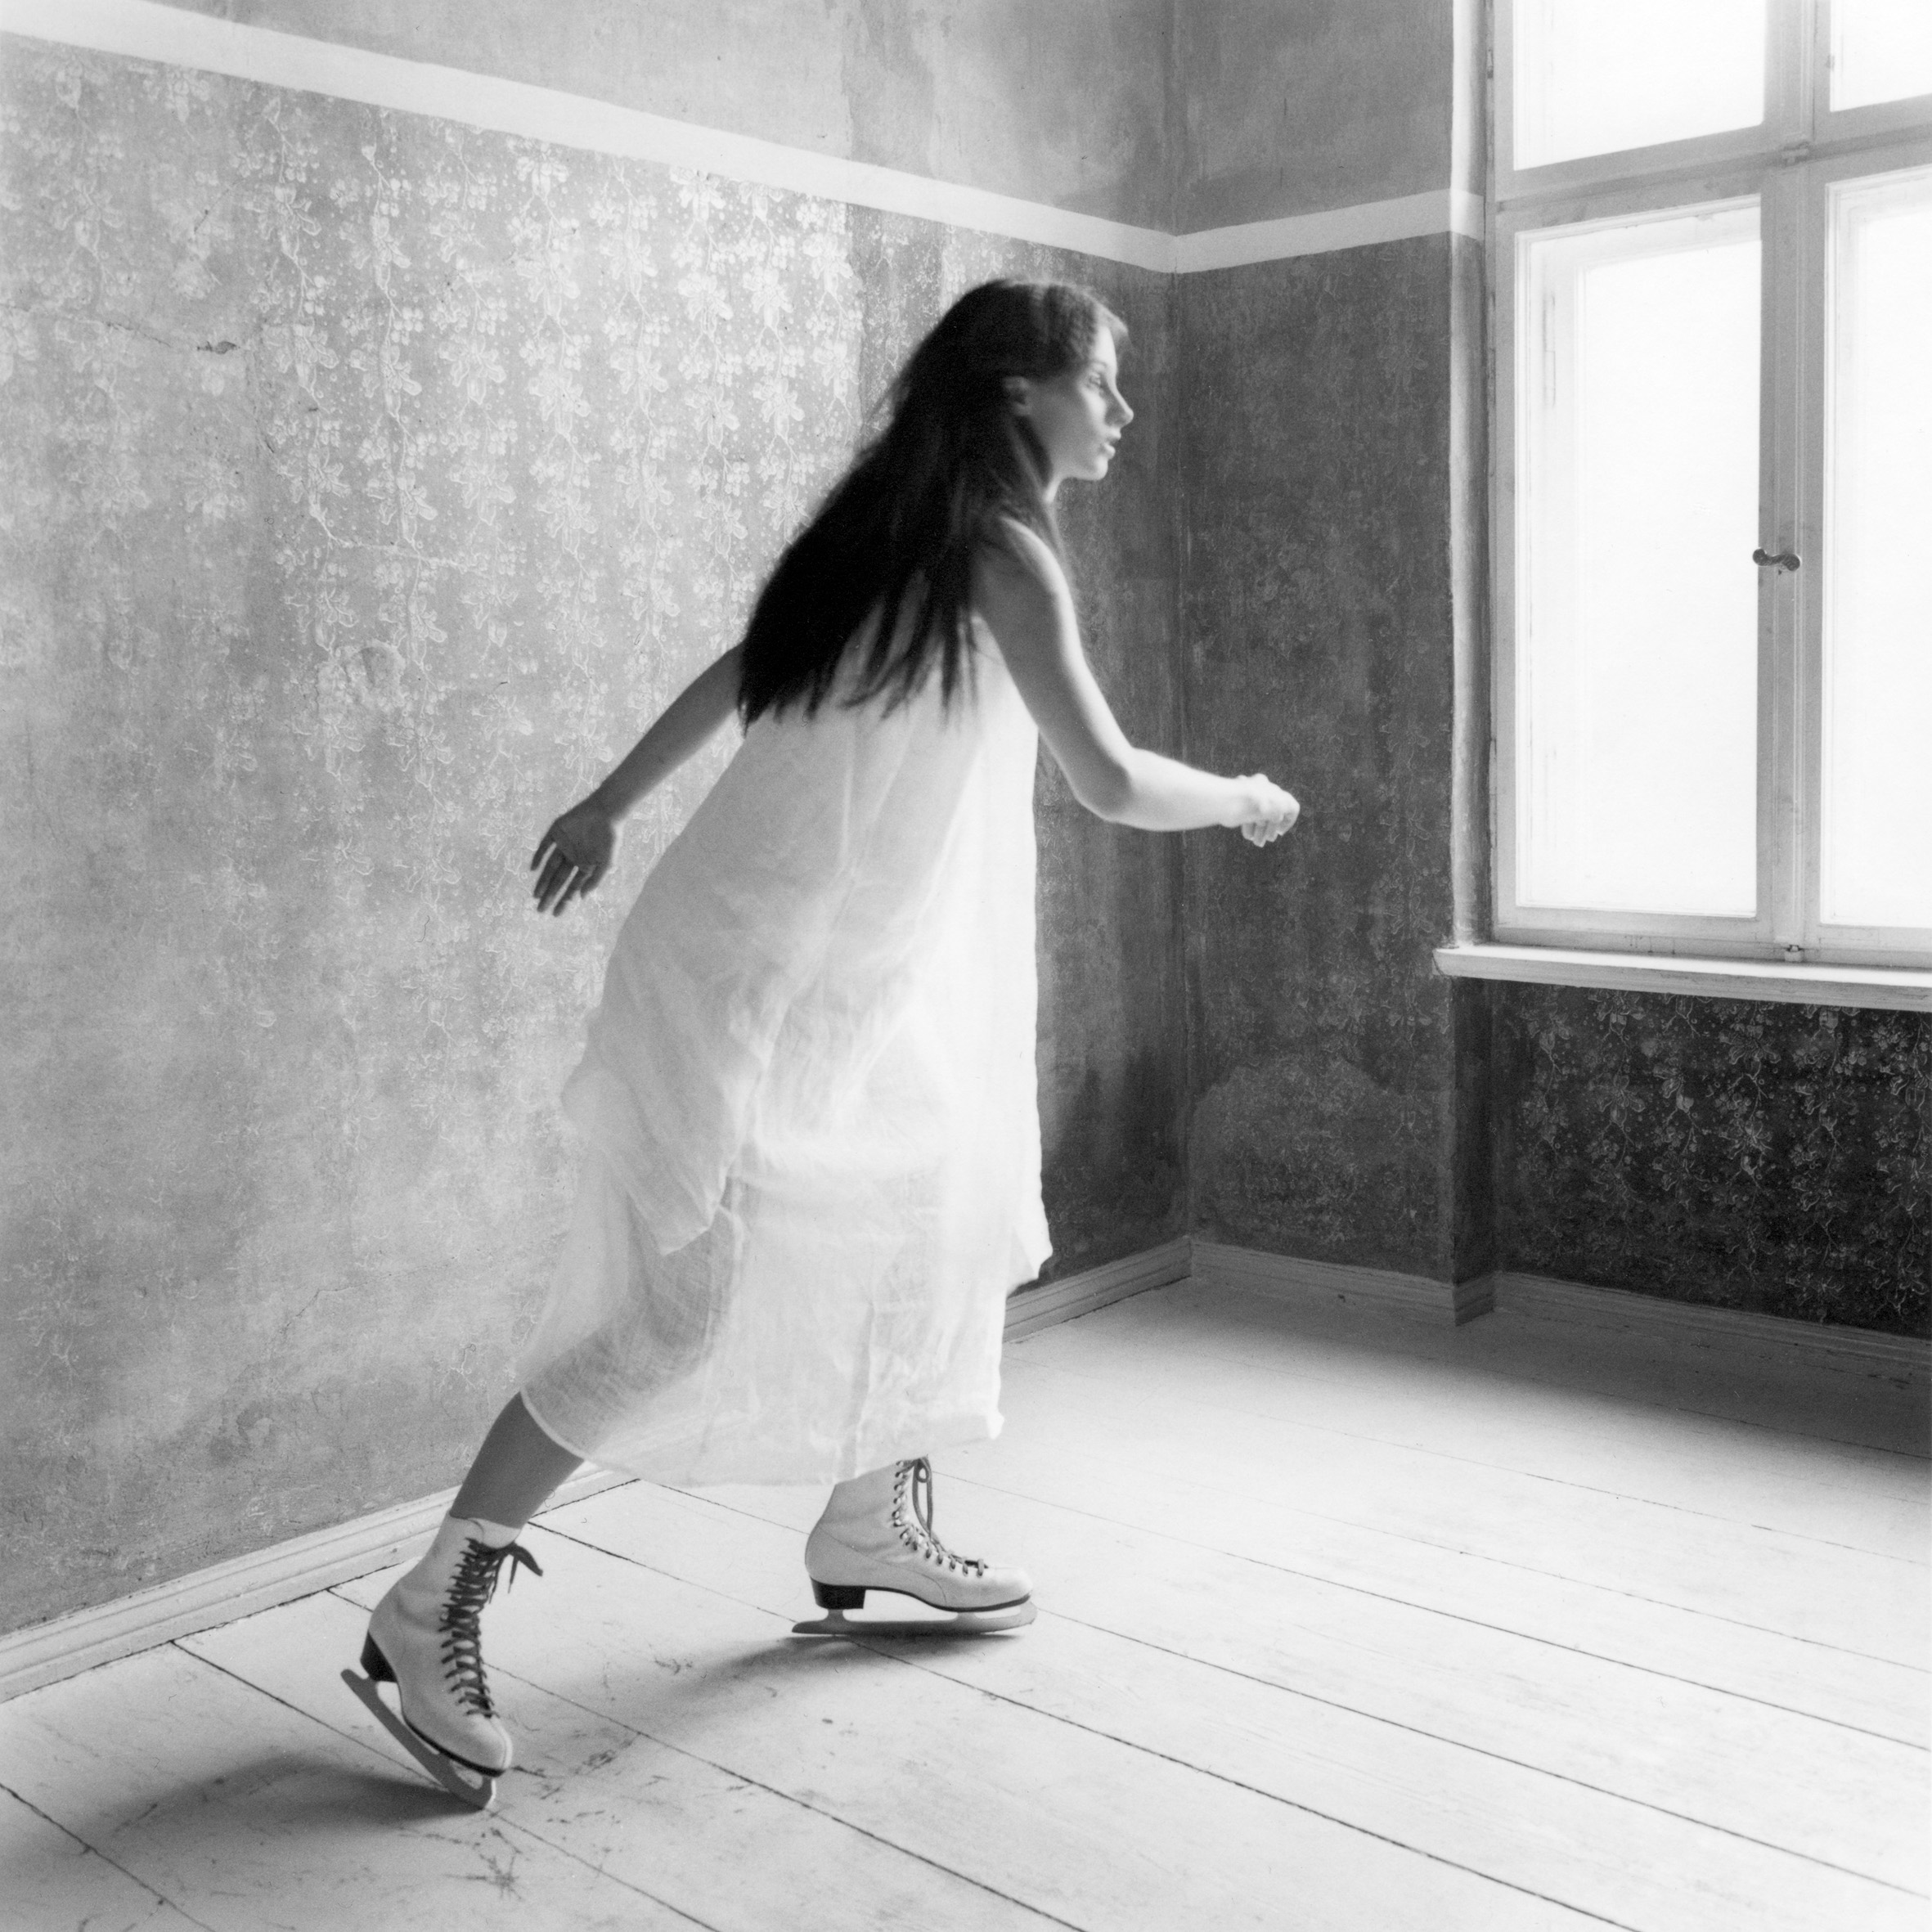 16_Fairytales_Glusgold.jpg